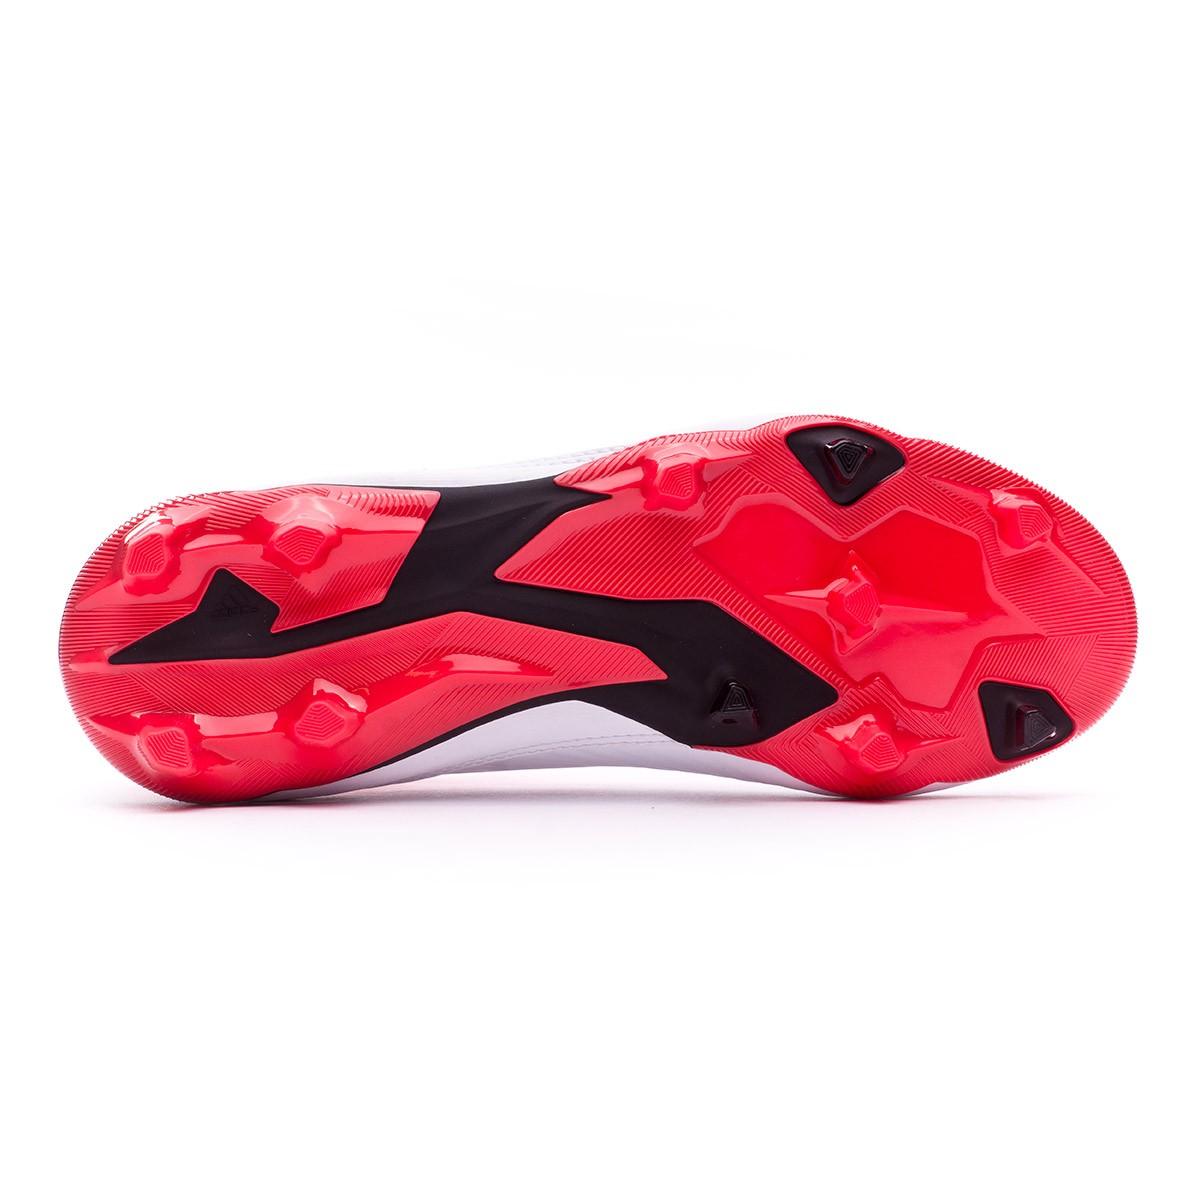 4d9154008e2 Football Boots adidas Kids Predator 18.3 FG White-Core black-Real coral -  Football store Fútbol Emotion